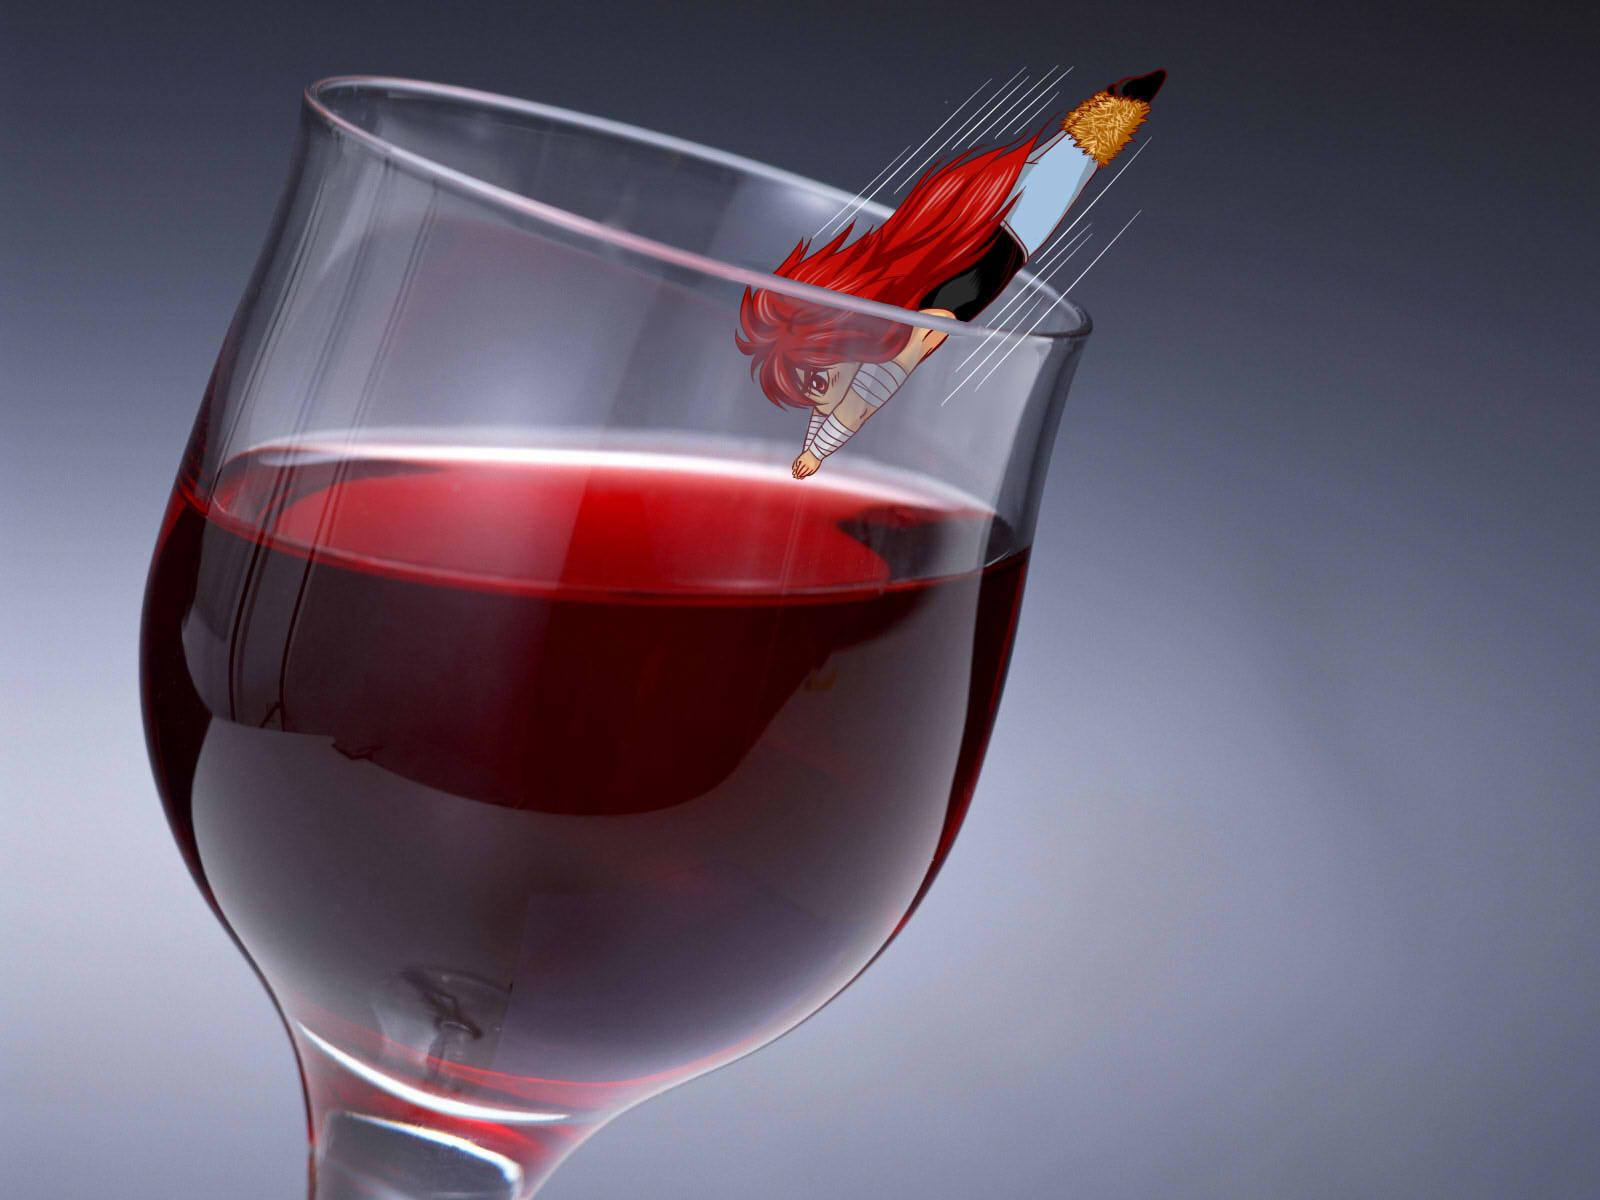 http://i66.servimg.com/u/f66/11/36/15/13/wine_b10.jpg